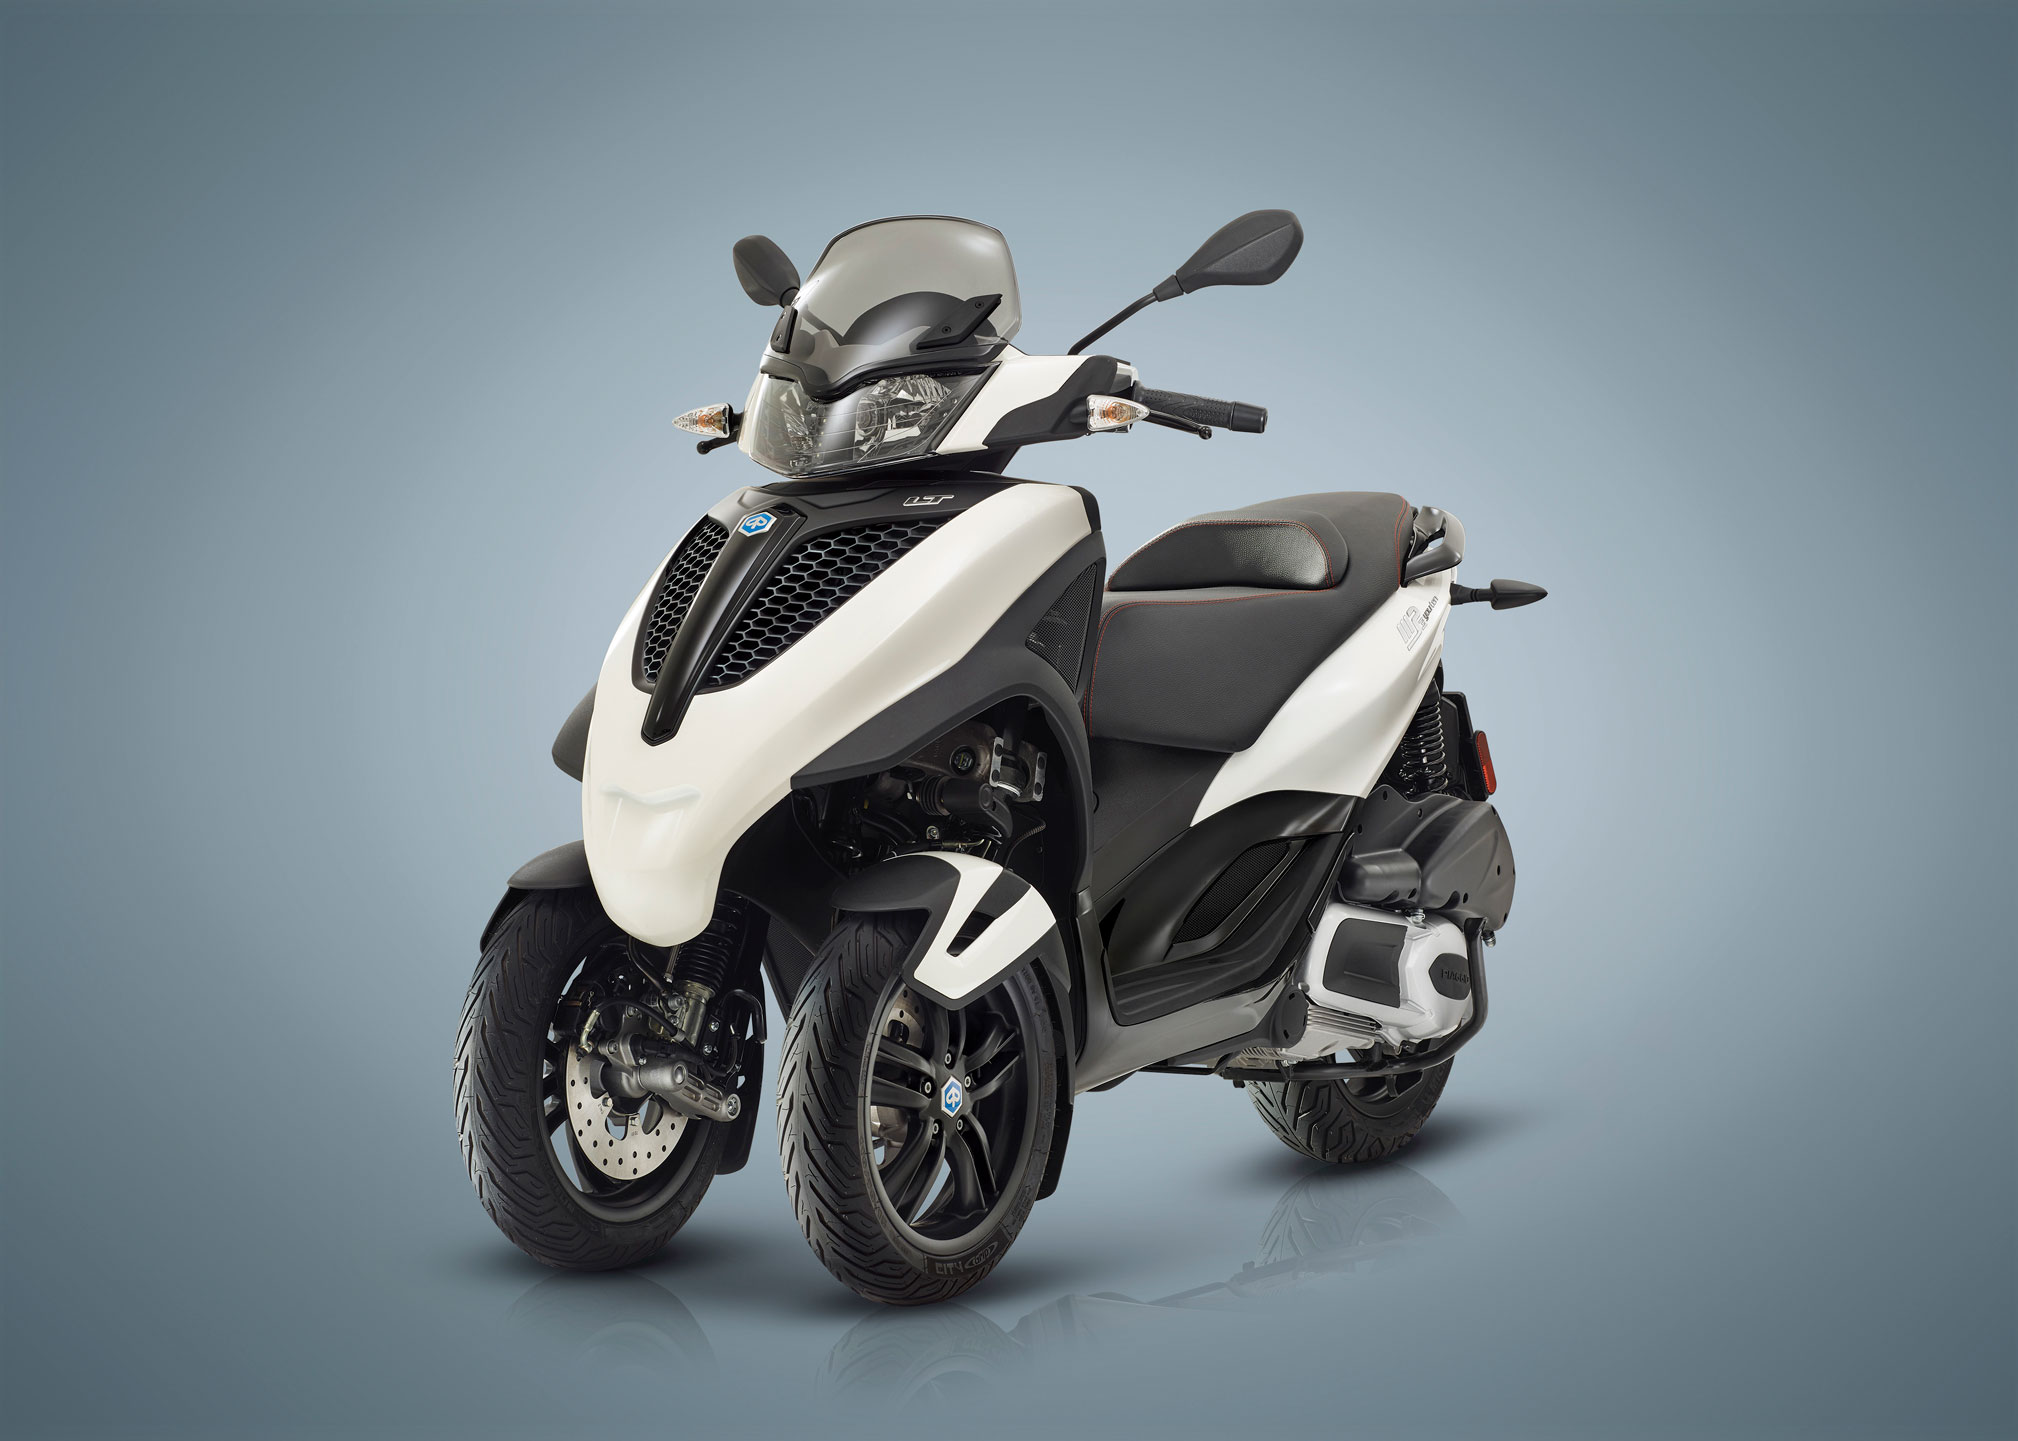 offre piaggio 500 d 39 avantage sur yourban 300 moto. Black Bedroom Furniture Sets. Home Design Ideas